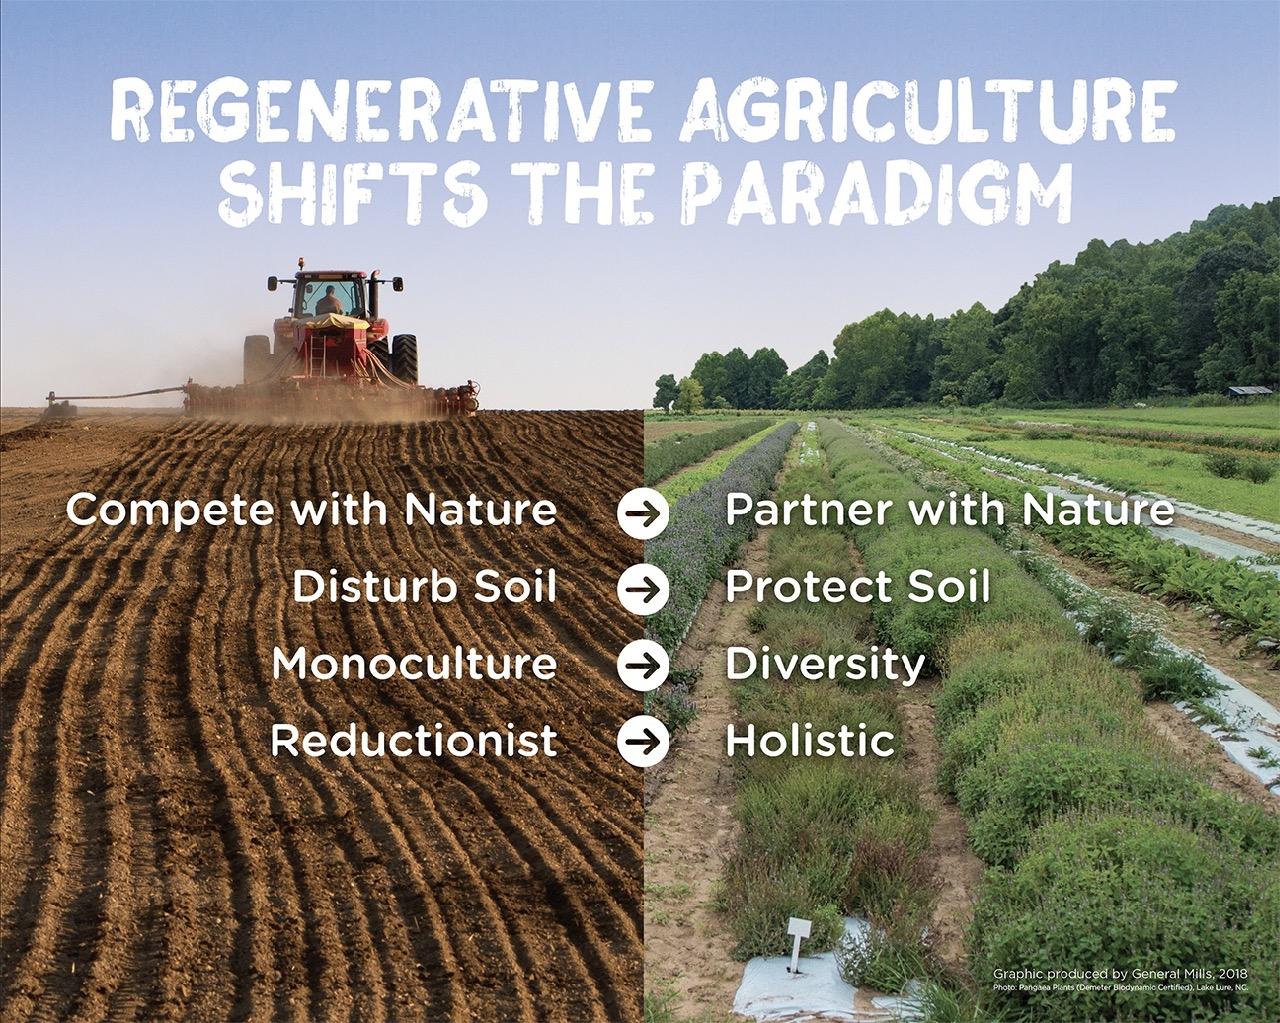 General Mills Regenerative Agriculture - Regeneration Newsroom